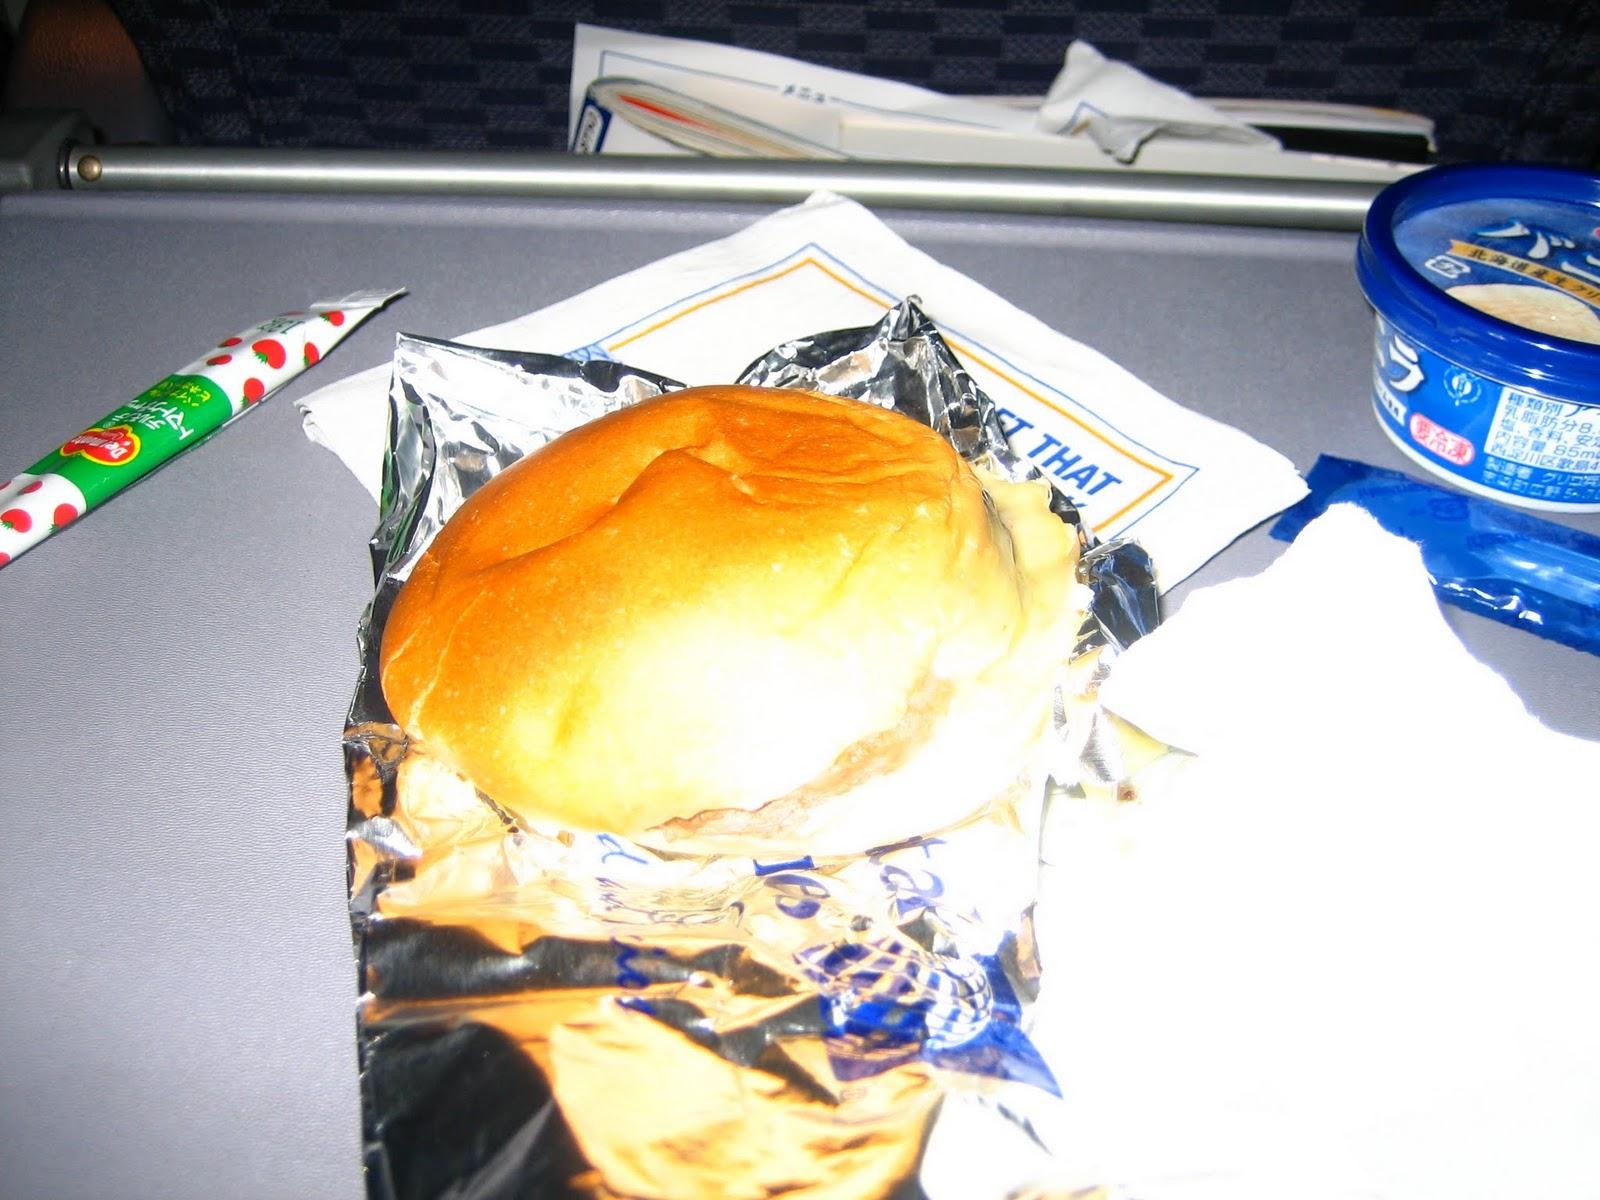 Continental-airline-cheese-hamburger